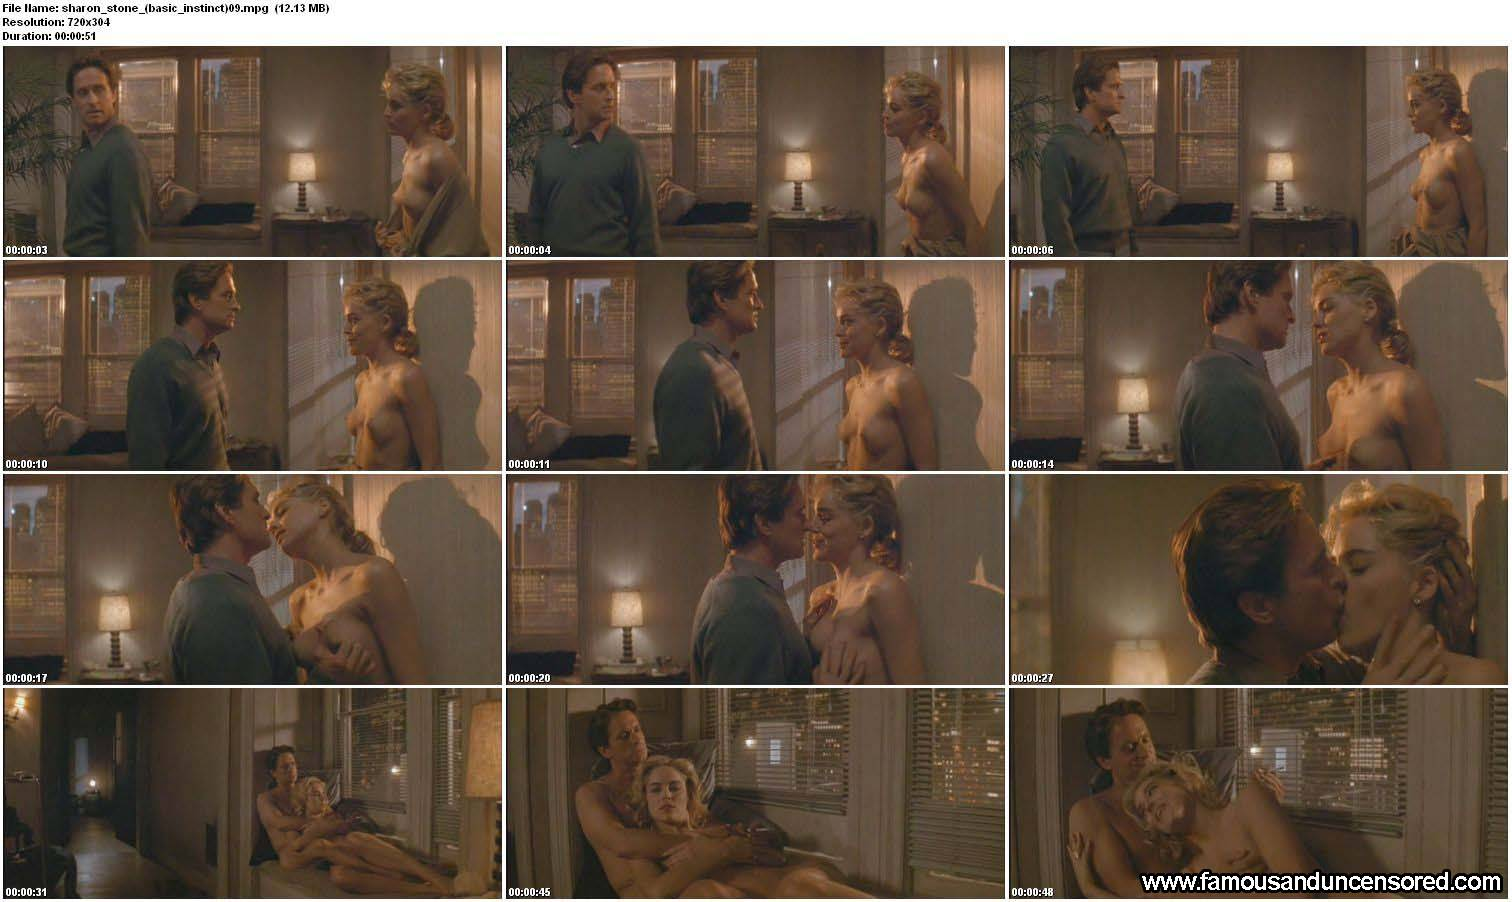 Sharon Stone Nude Sexy Scene in Basic Instinct Celebrity Photos and